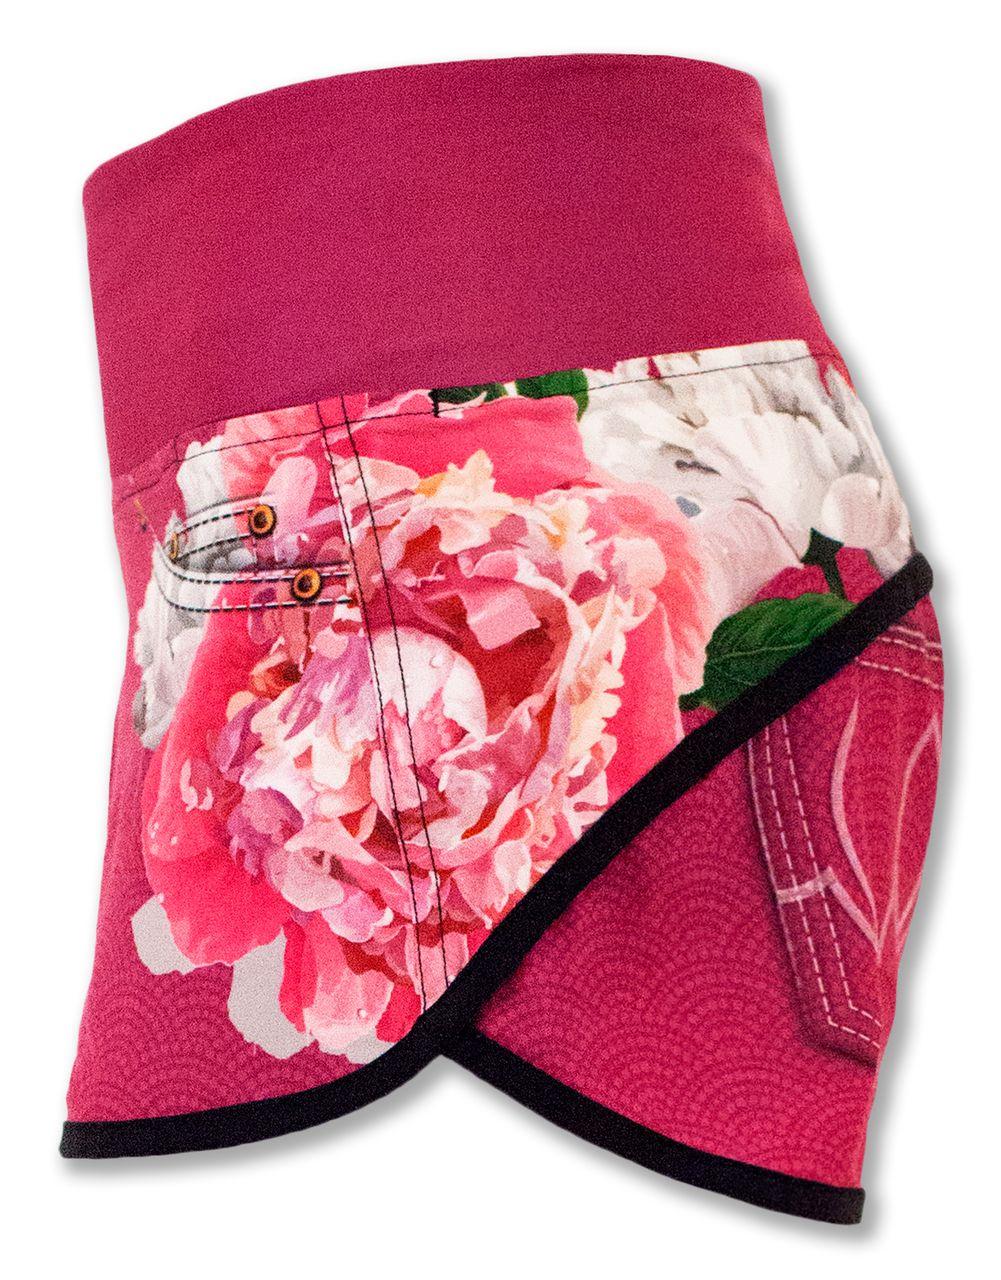 02a9e14a64315 INKnBURN Pink Flora Shorts Left Side Waistband Up